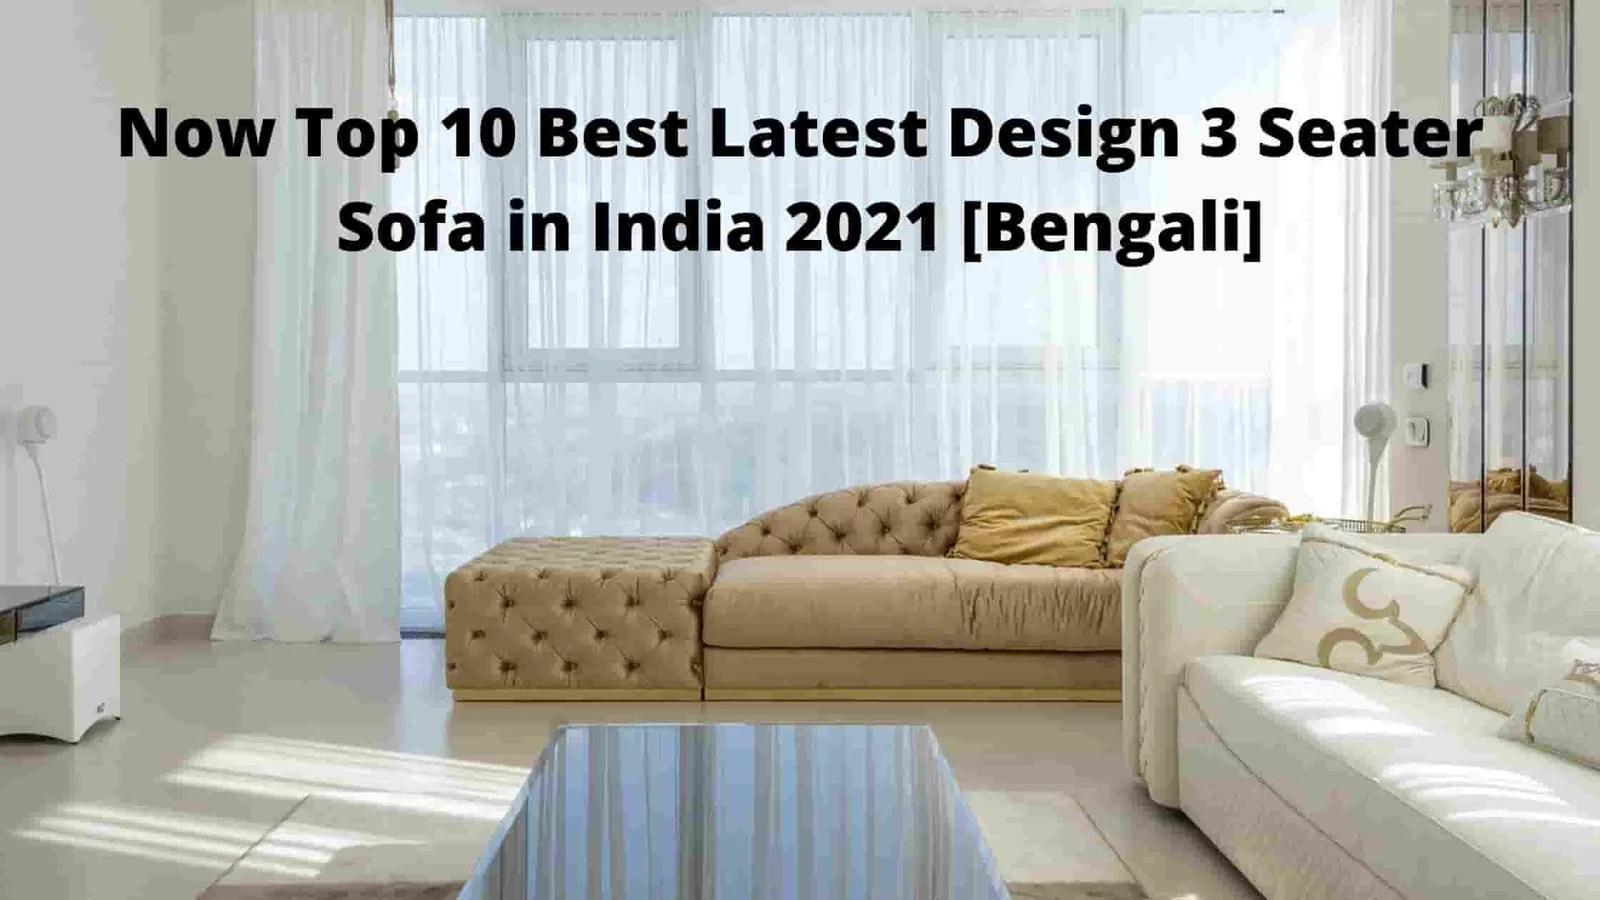 Now Top 10 Best Latest Design 3 Seater Sofa in India 2021 [Bengali]